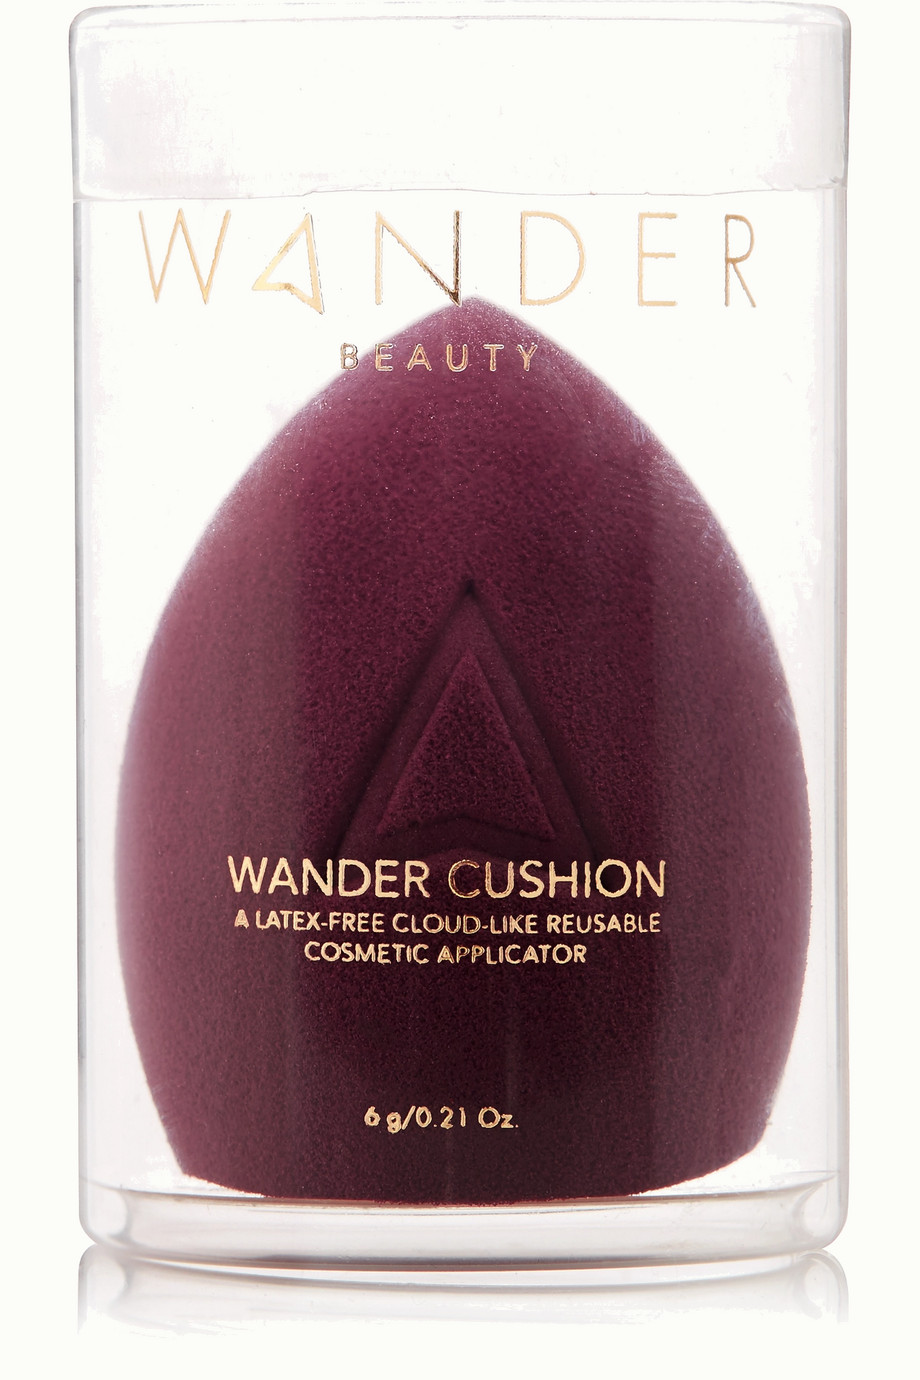 Wander Beauty Wander Cushion sponge